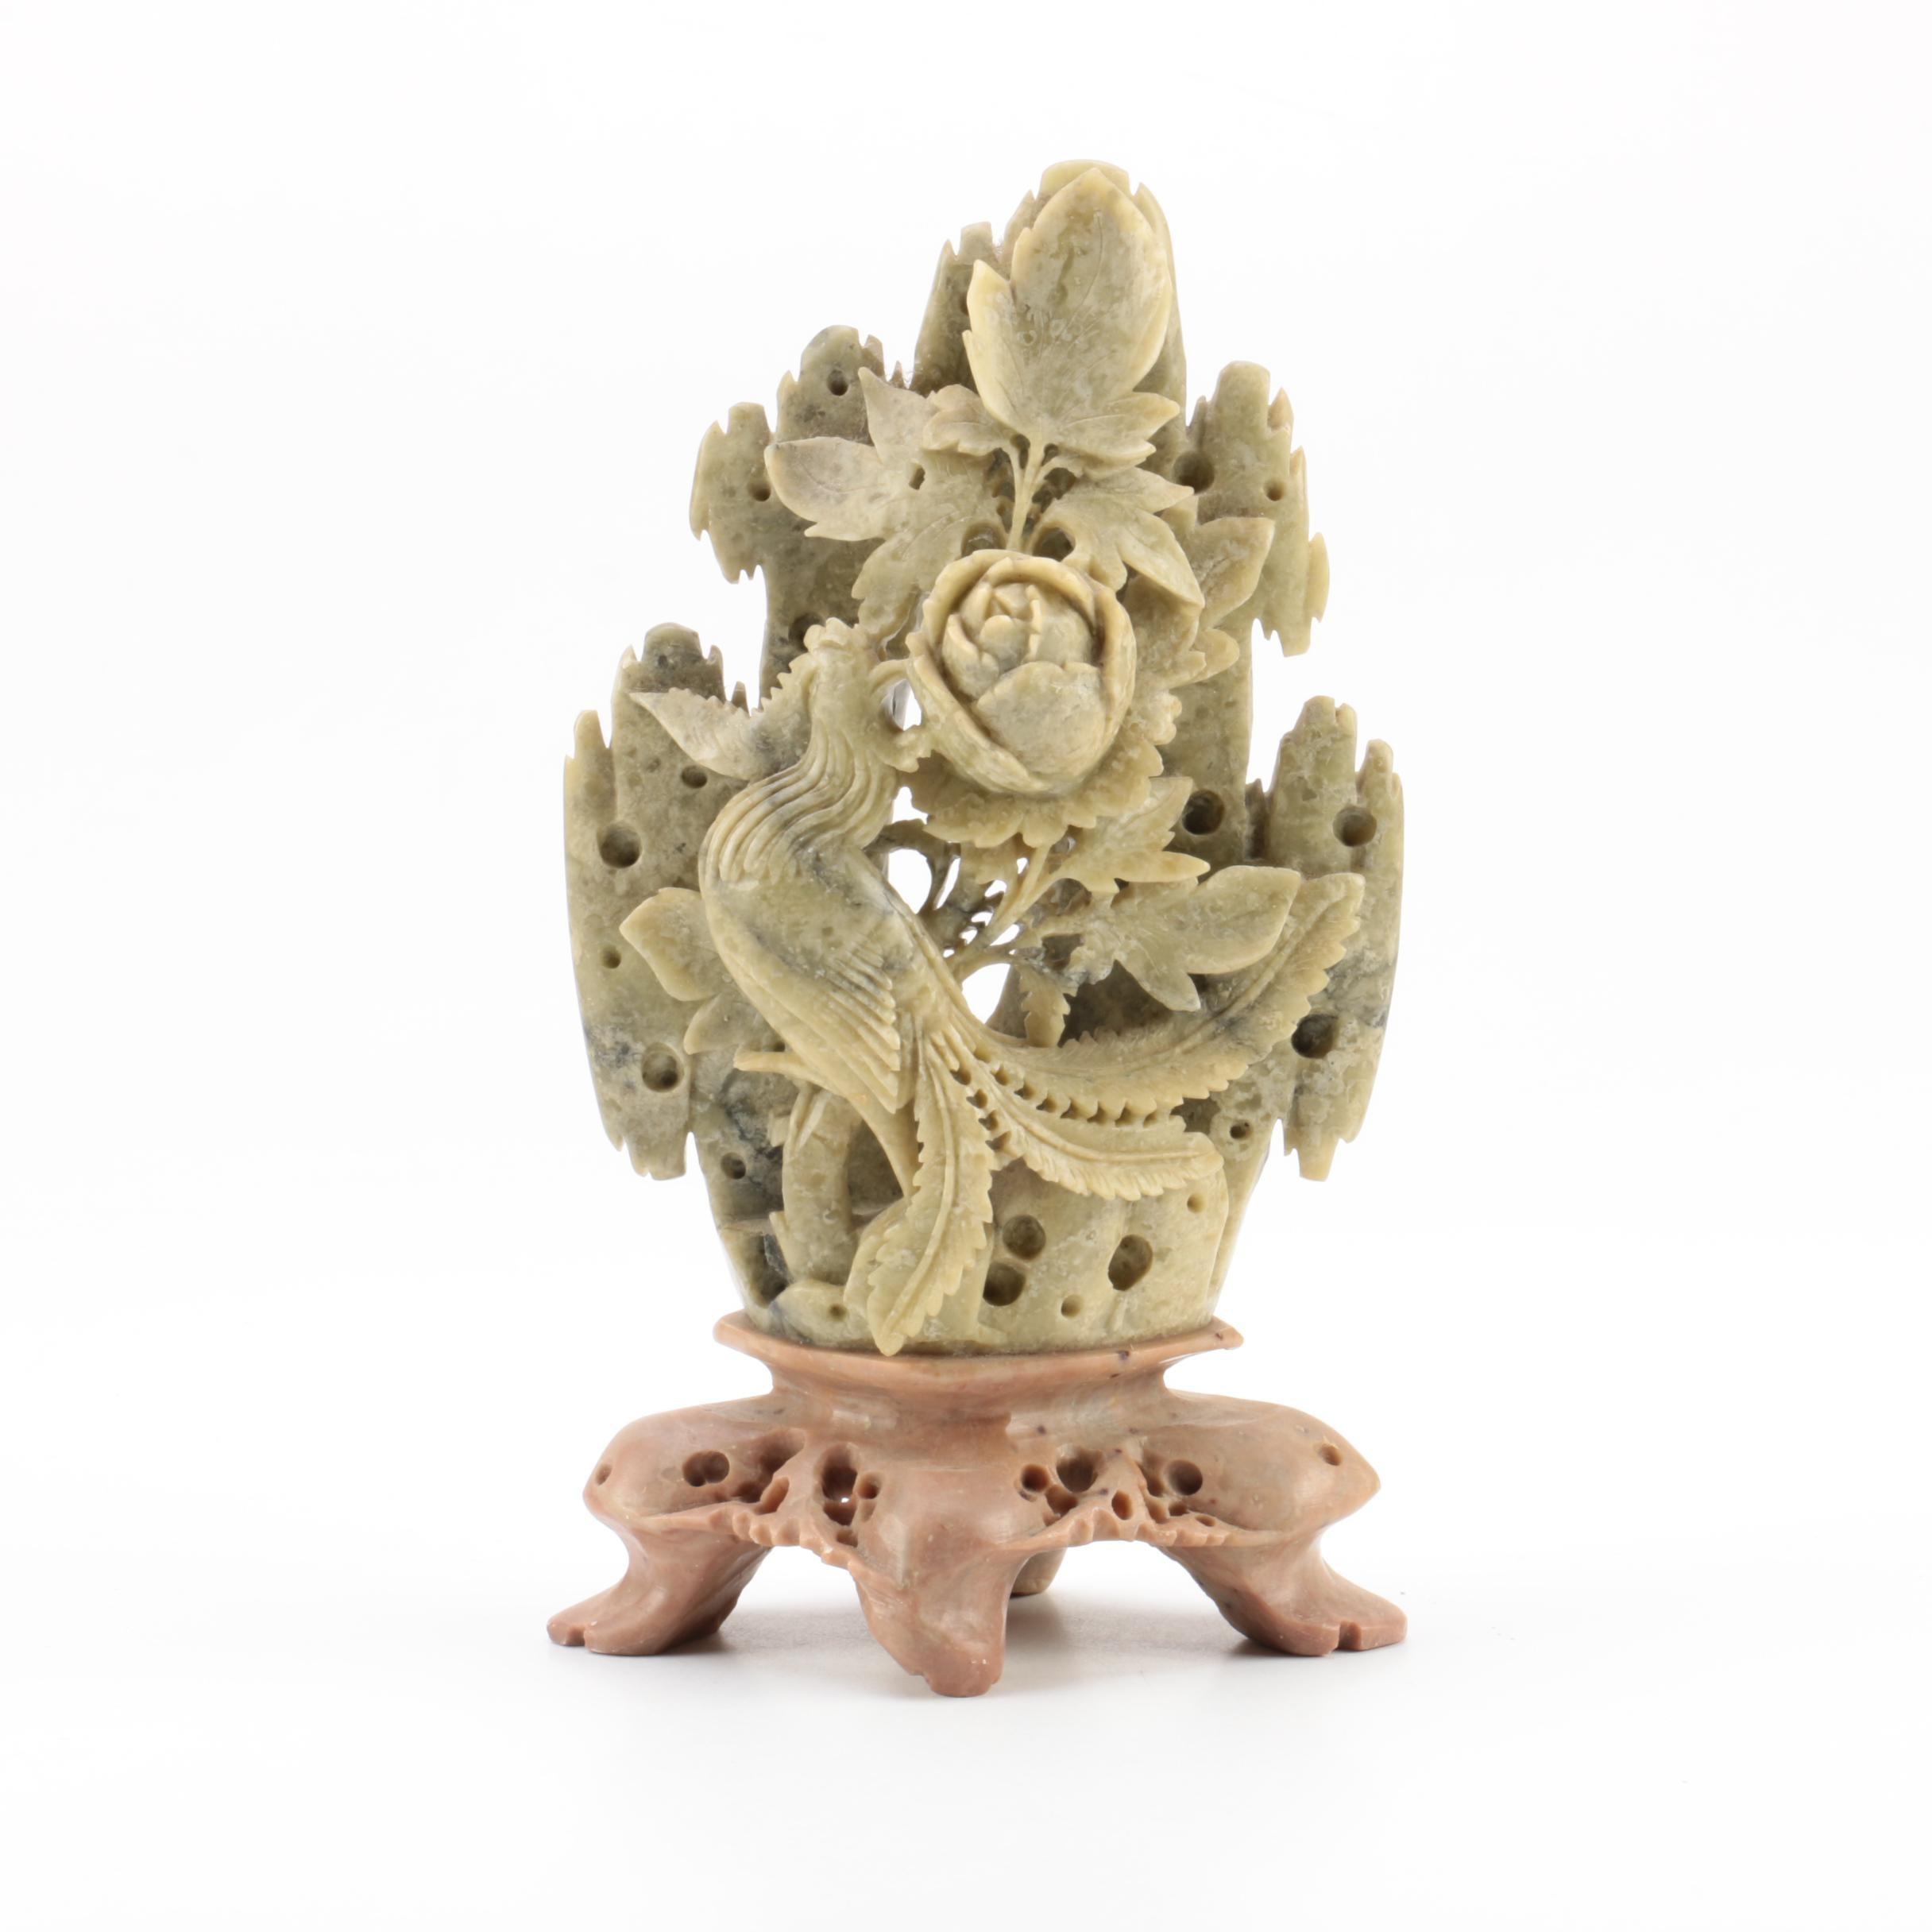 Carved Soapstone Floral Motif Figurine